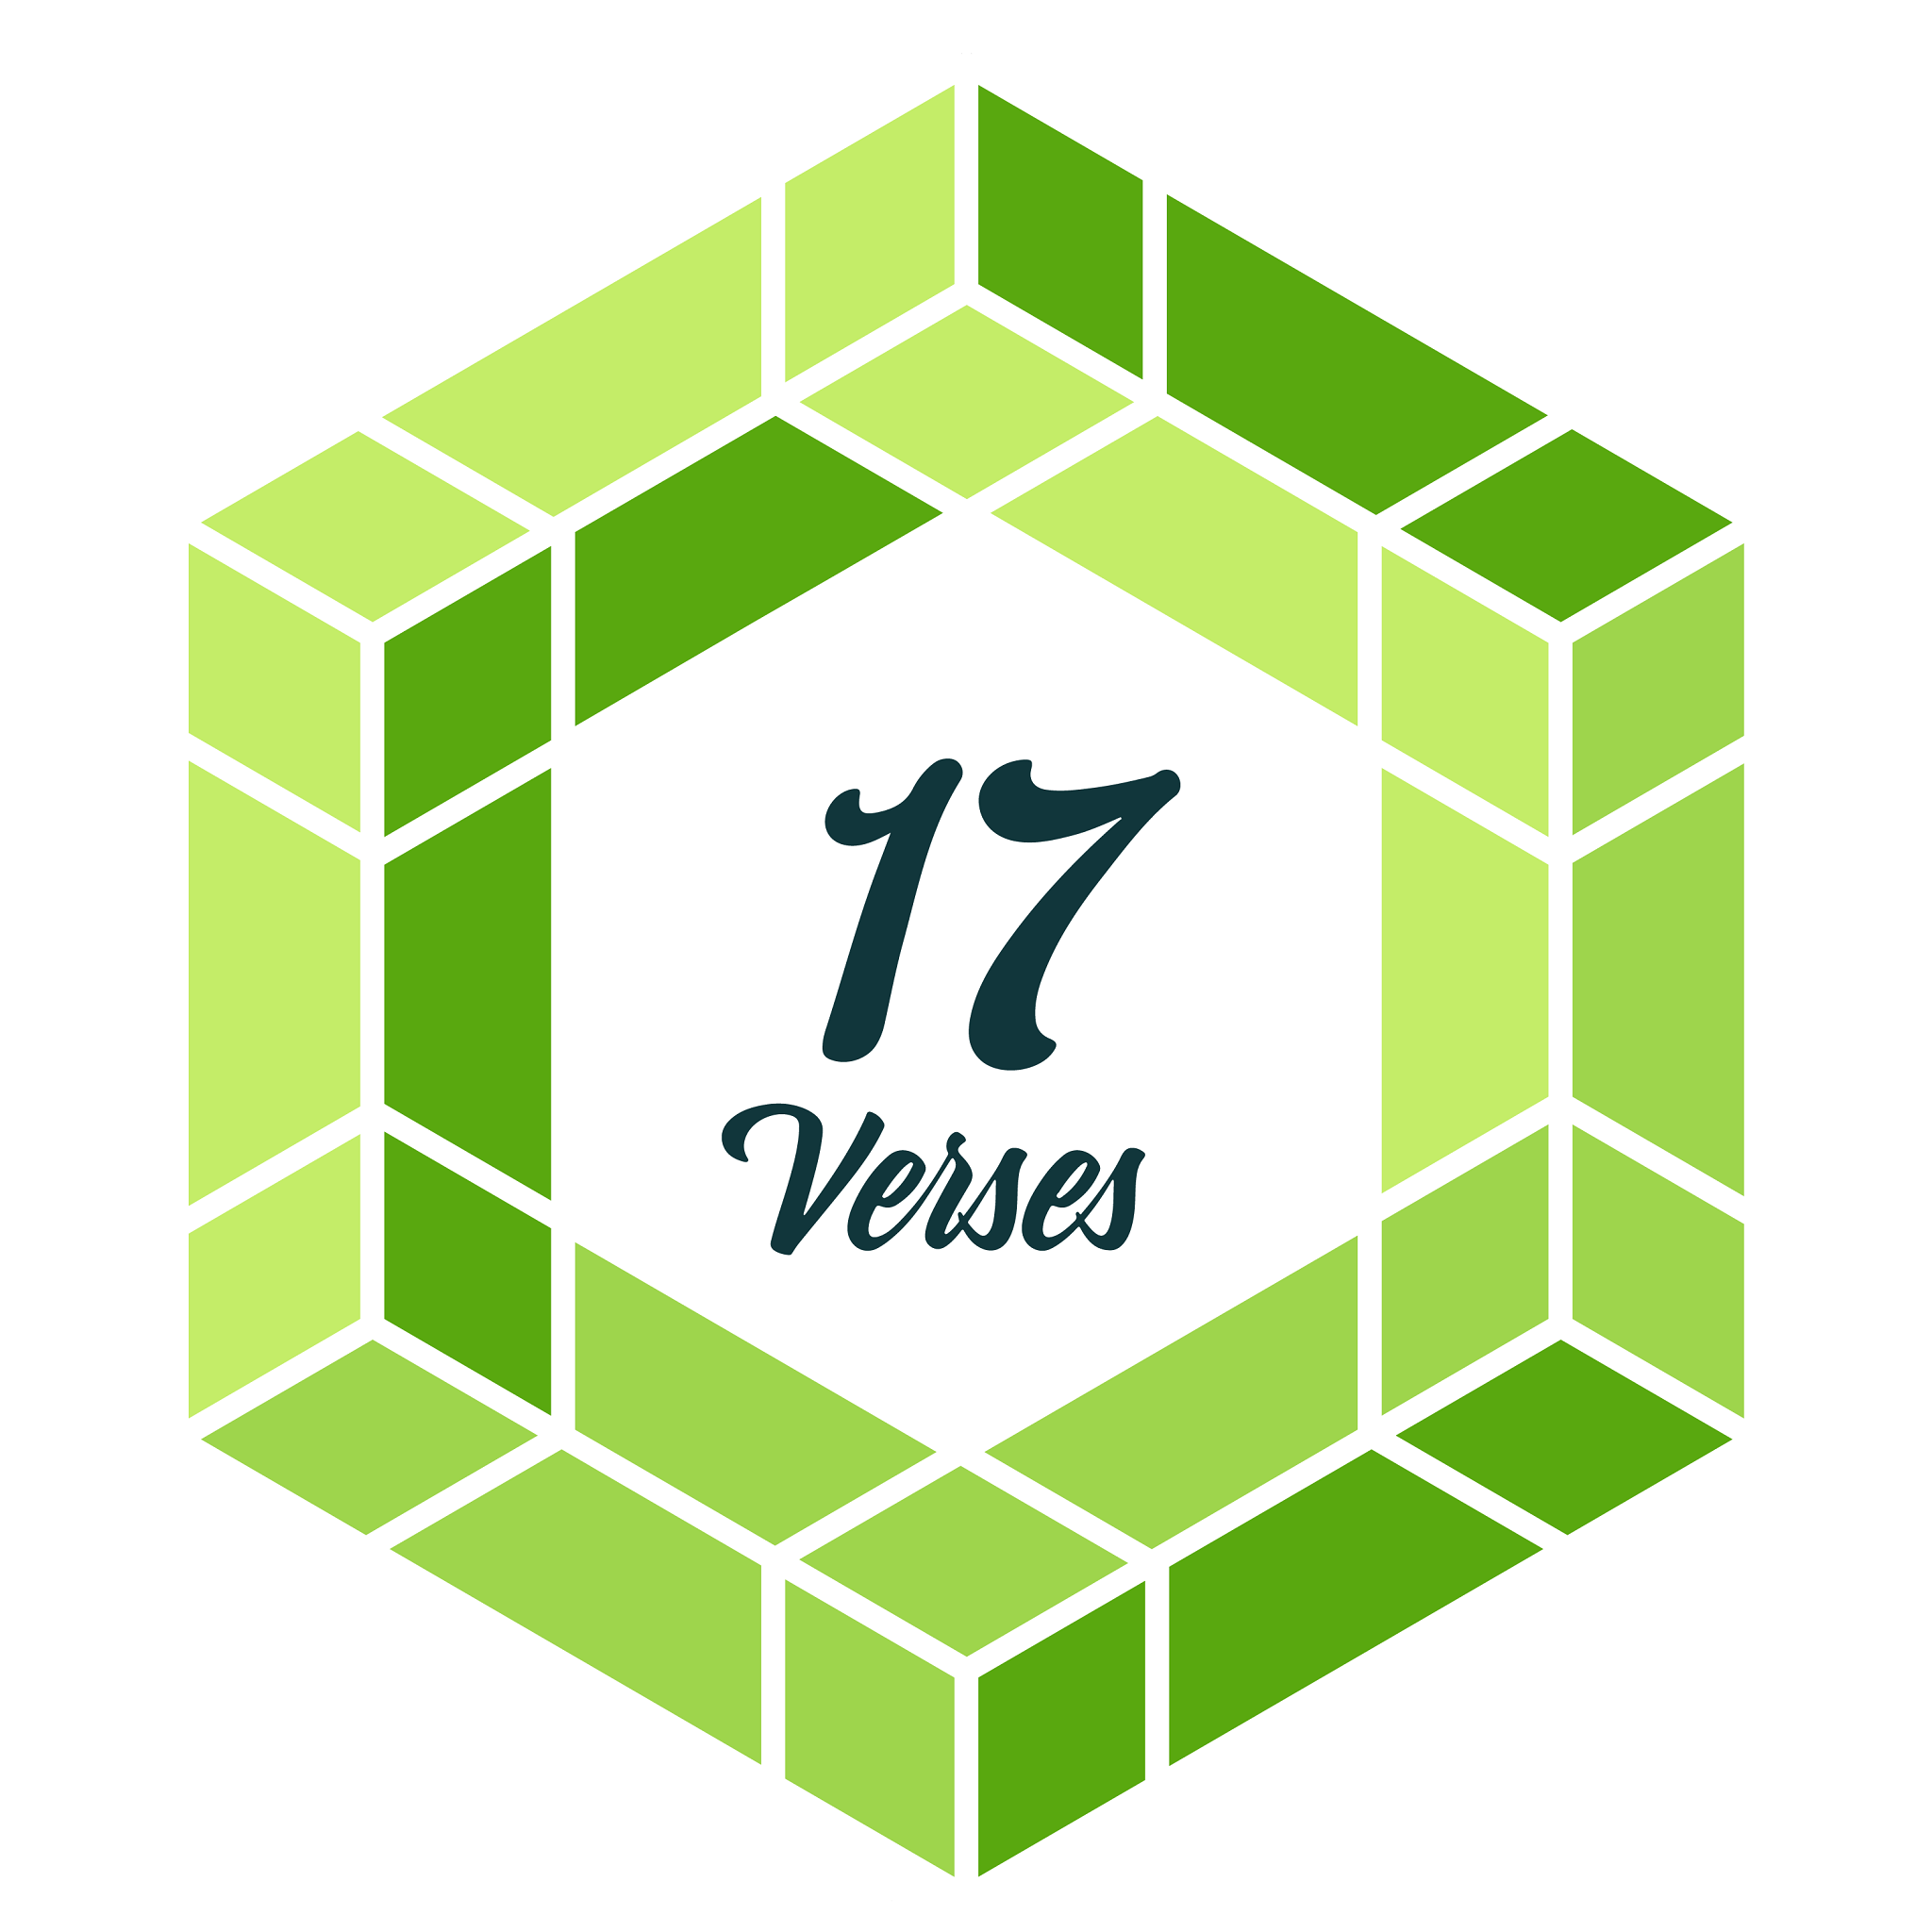 Year 2 - Surah 9 (At-Tauba), Verses 17-29